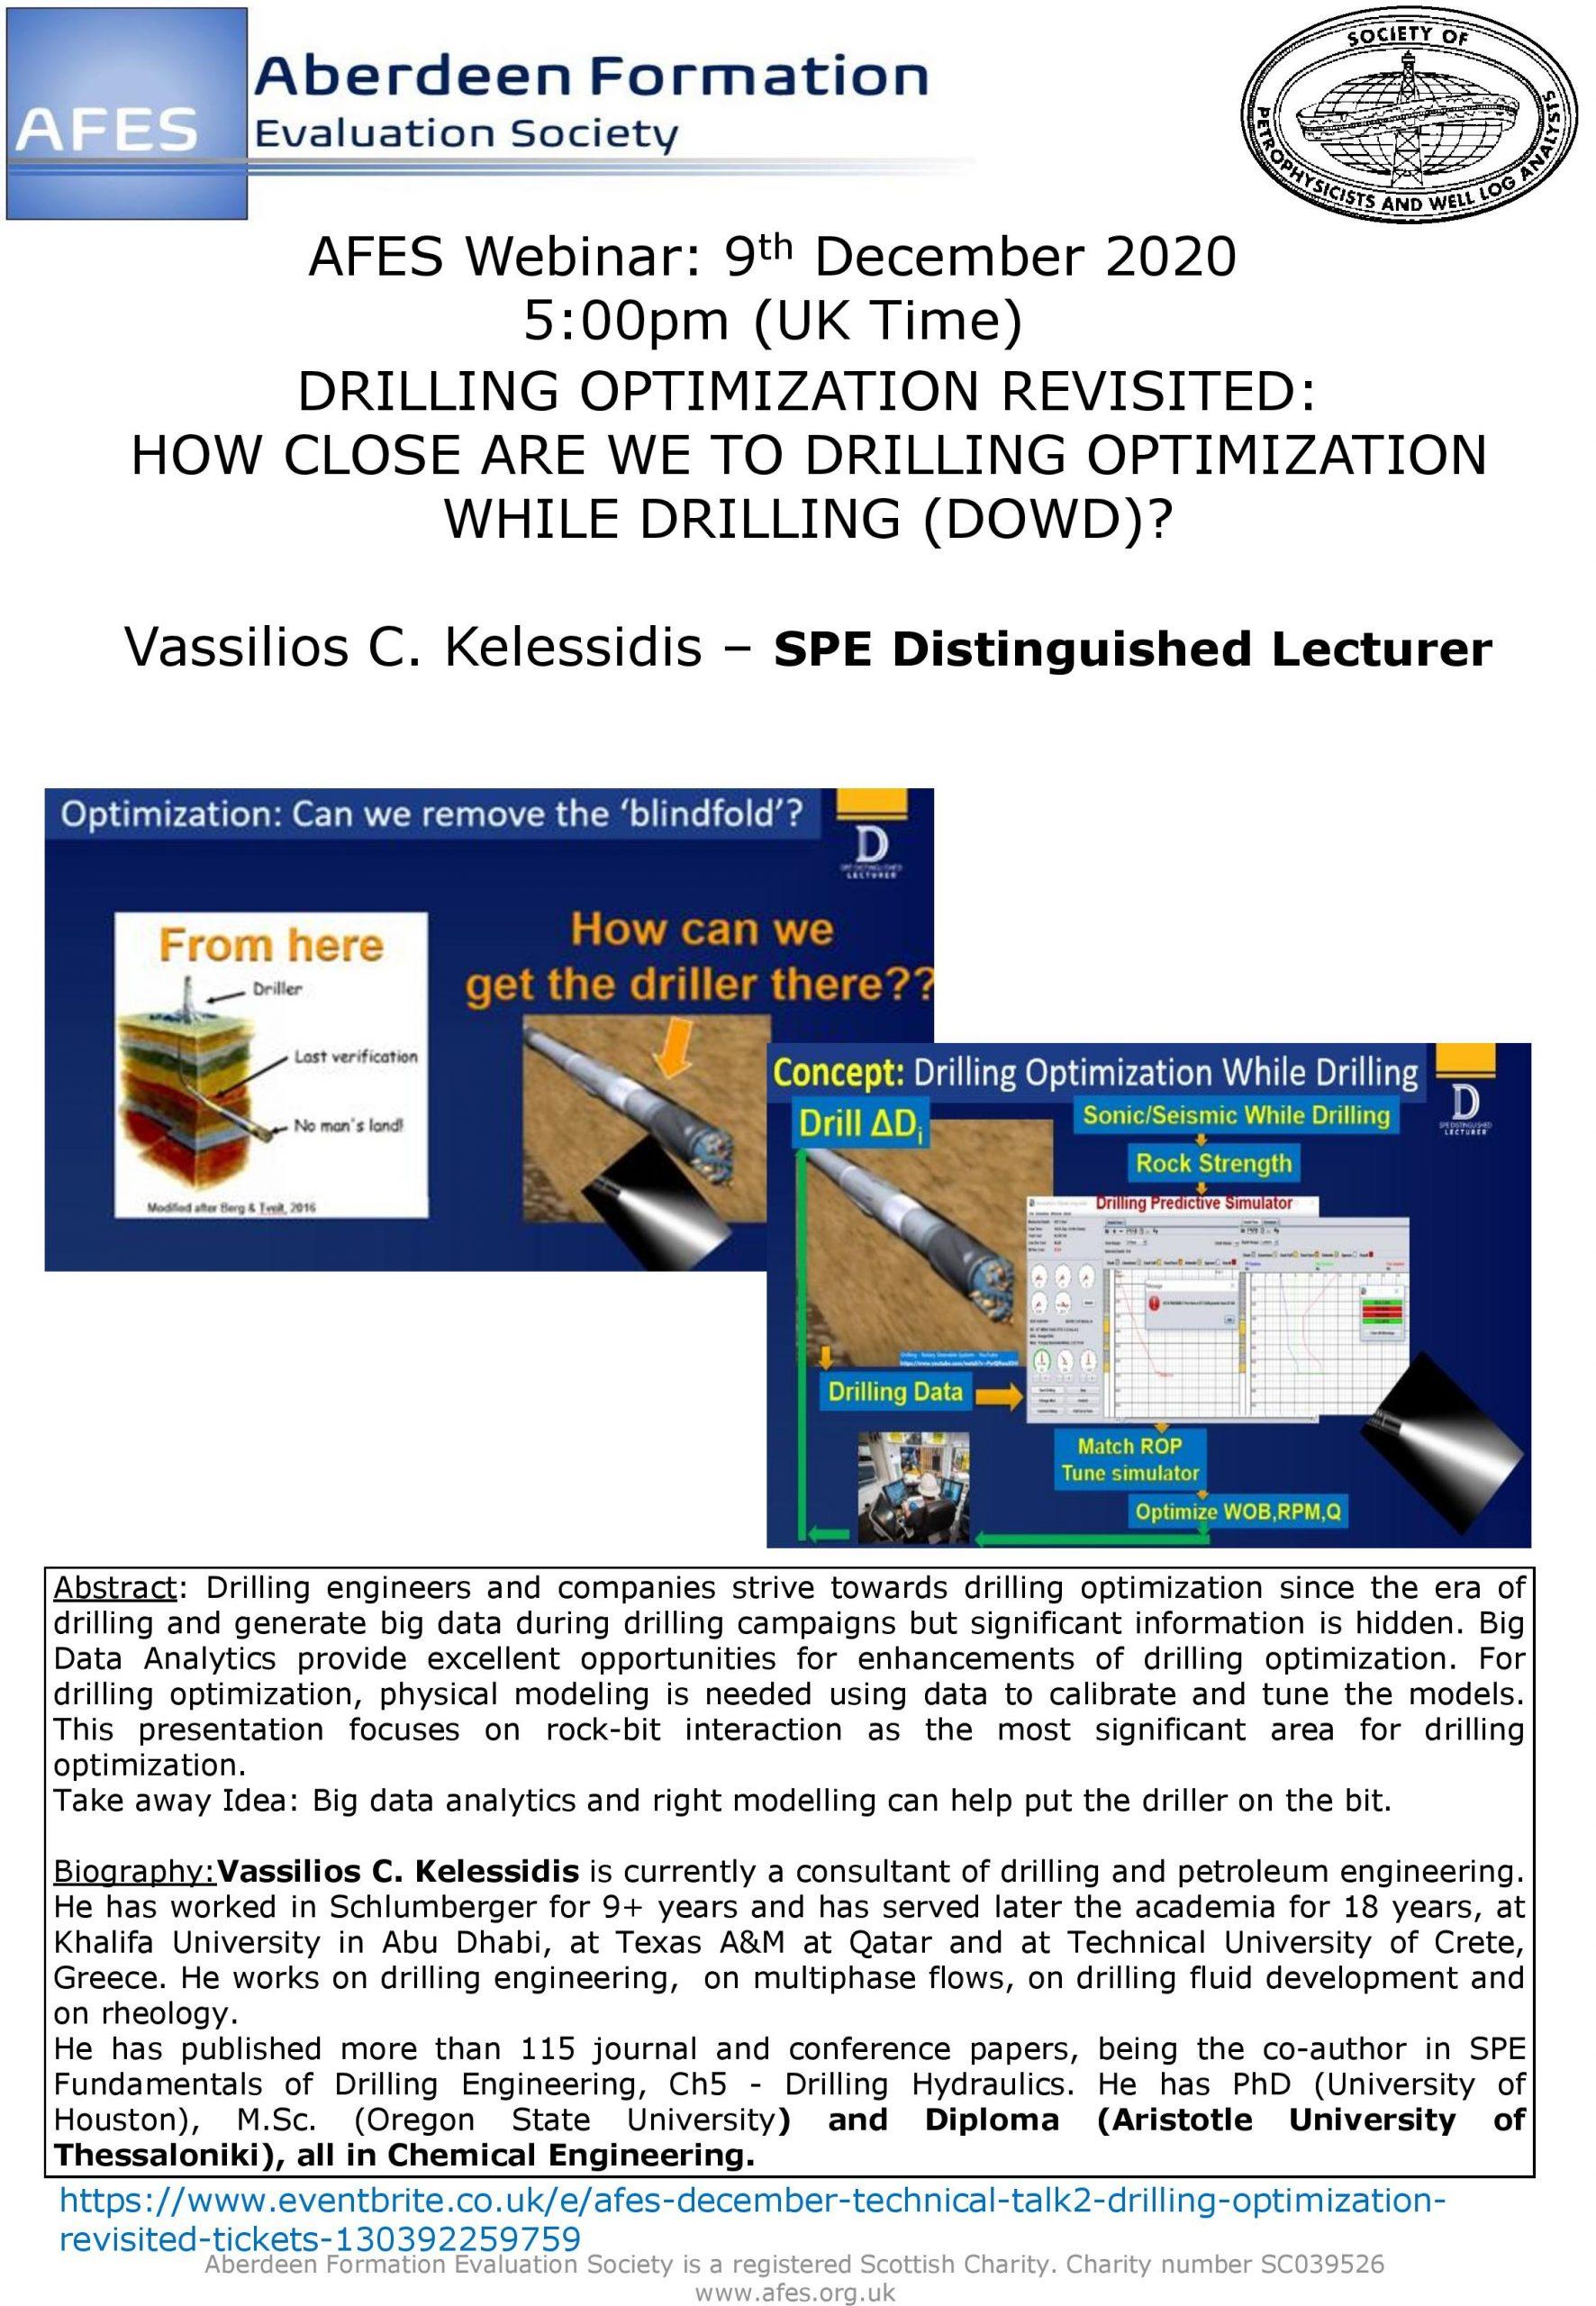 Technical Talk: Vassilios Kelessidis (SPE Distinguished Lecturer)